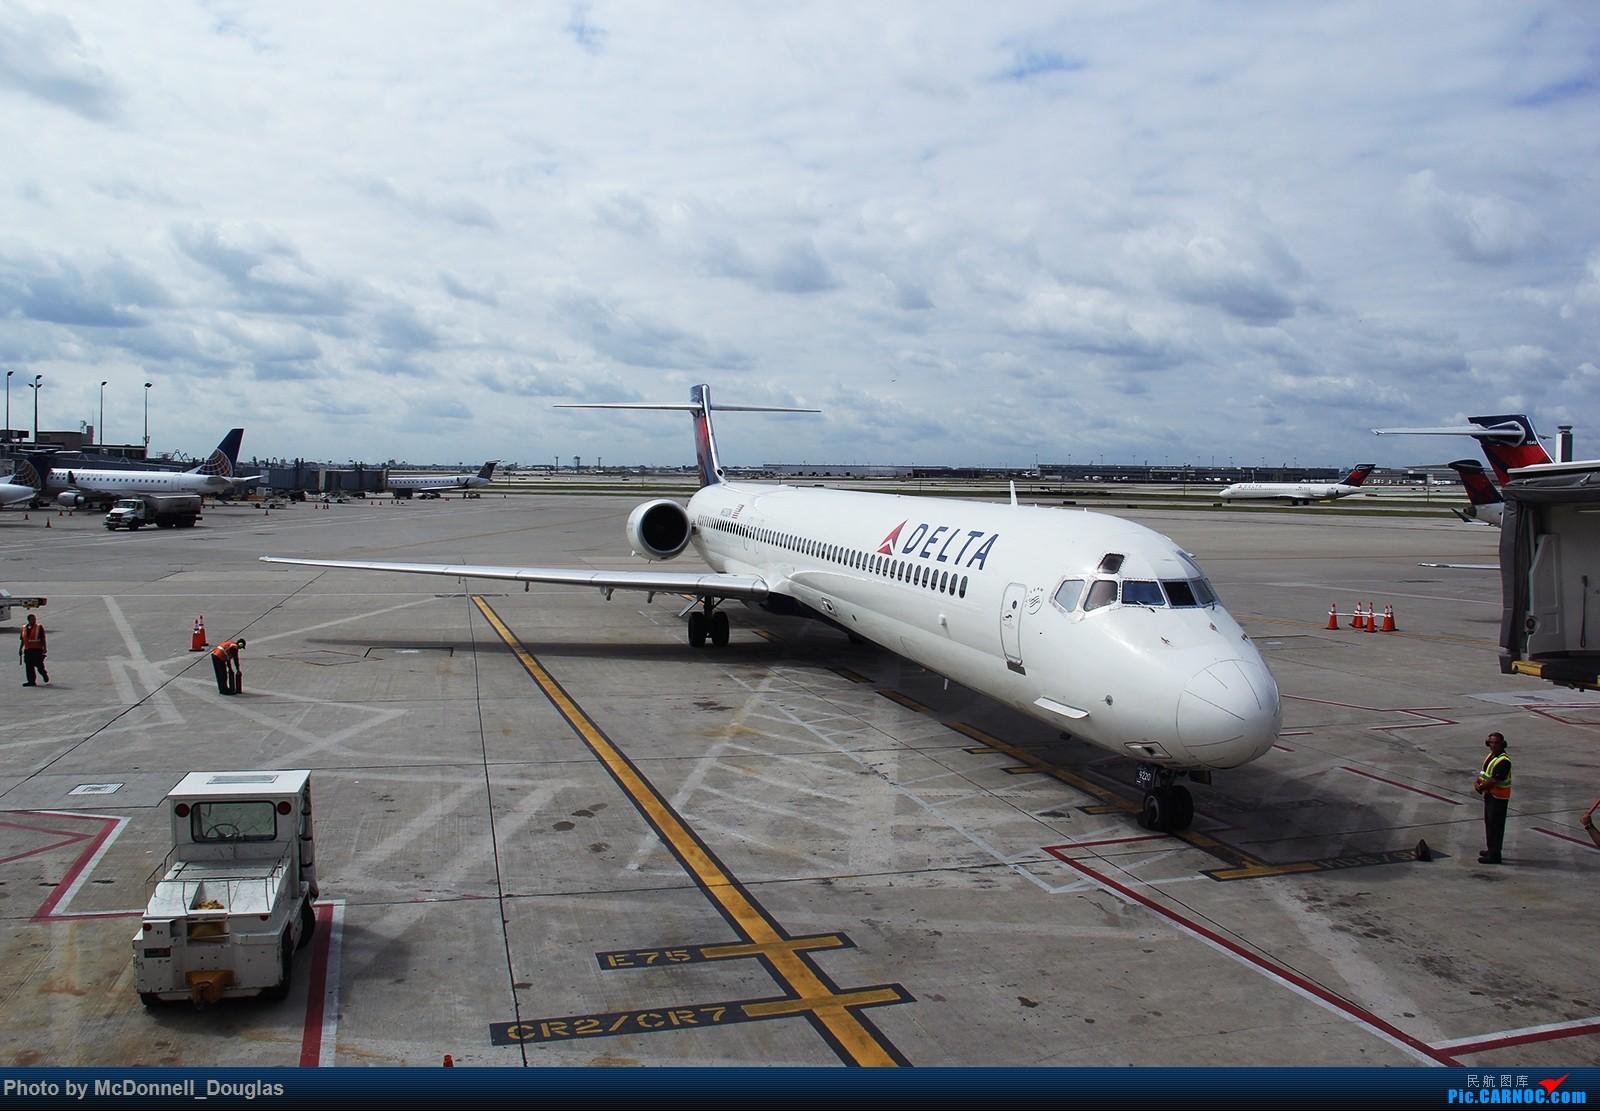 Re:[原创]【上海飞友会】图会很多,也有很多驾驶舱,杂七杂八的美帝,梦寐以求的圣马丁,这更绝不弃贴【驾驶舱已出现】 MCDONNELL DOUGLAS MD-90-30 N920DN 美国芝加哥奥黑尔国际机场